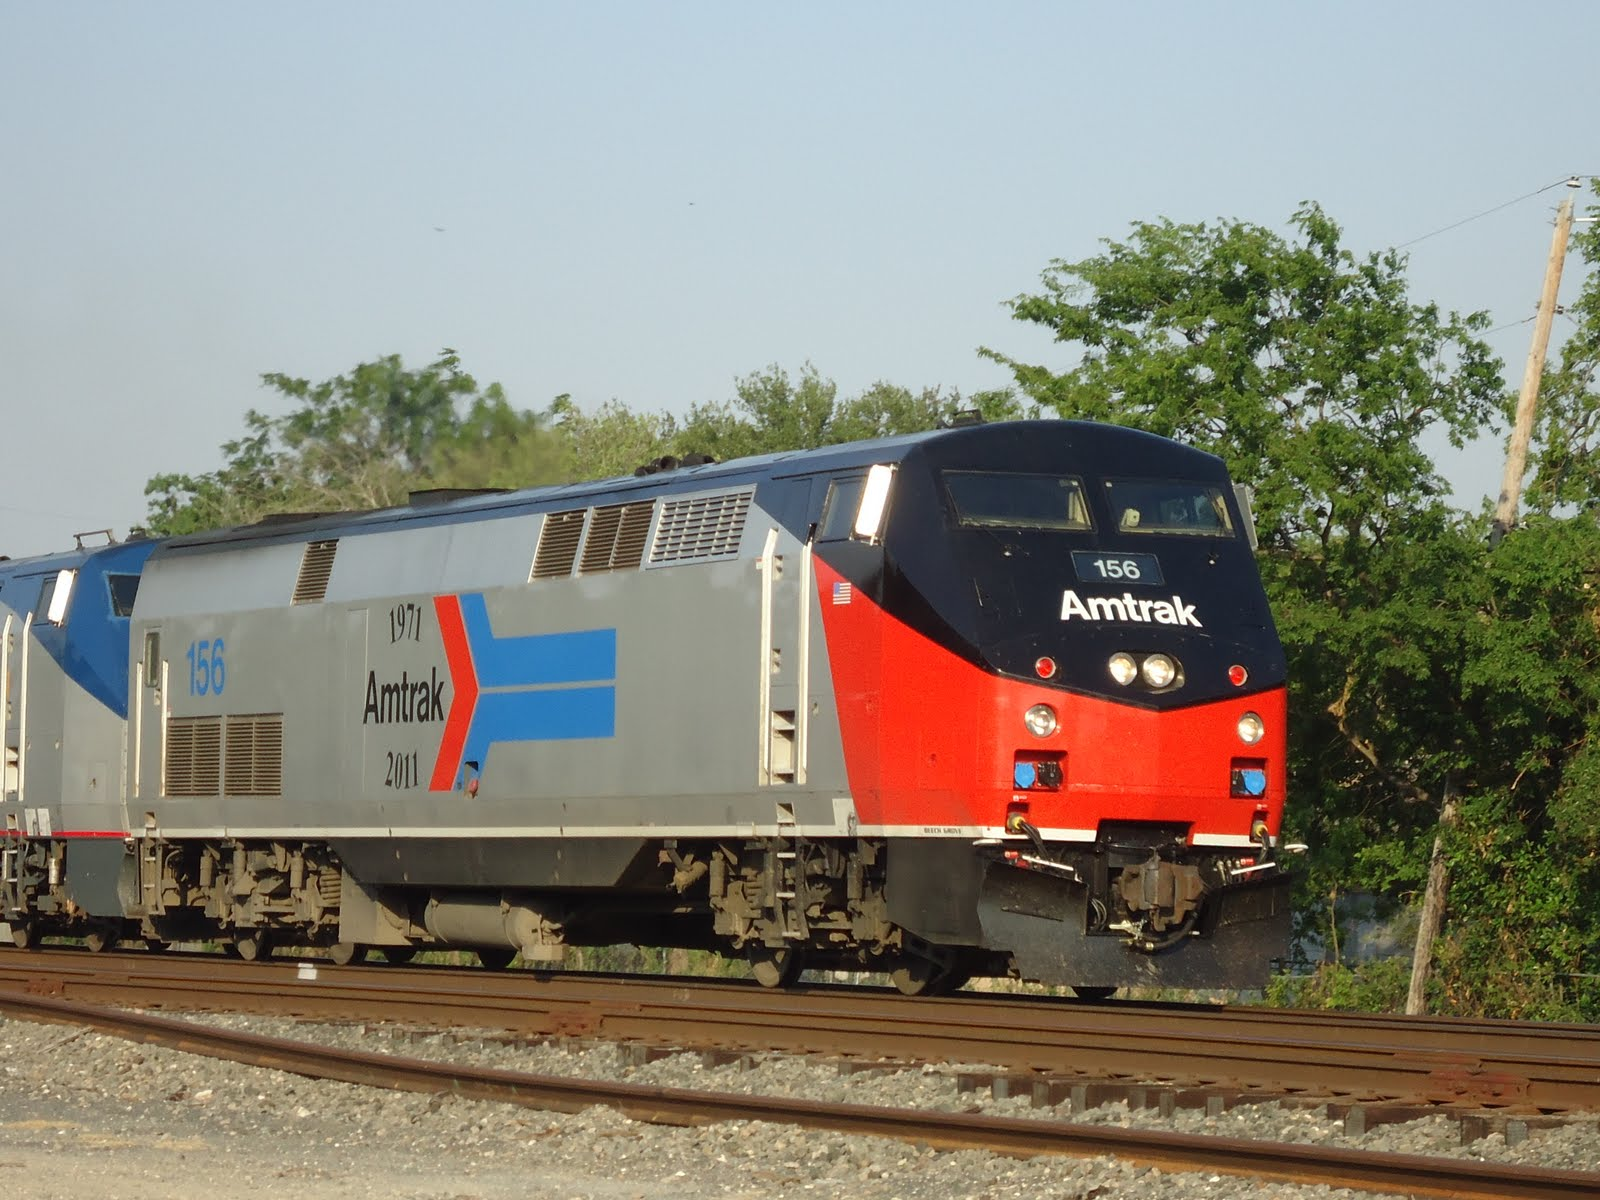 Texas Railroading Amtrak 156 In Central Texas